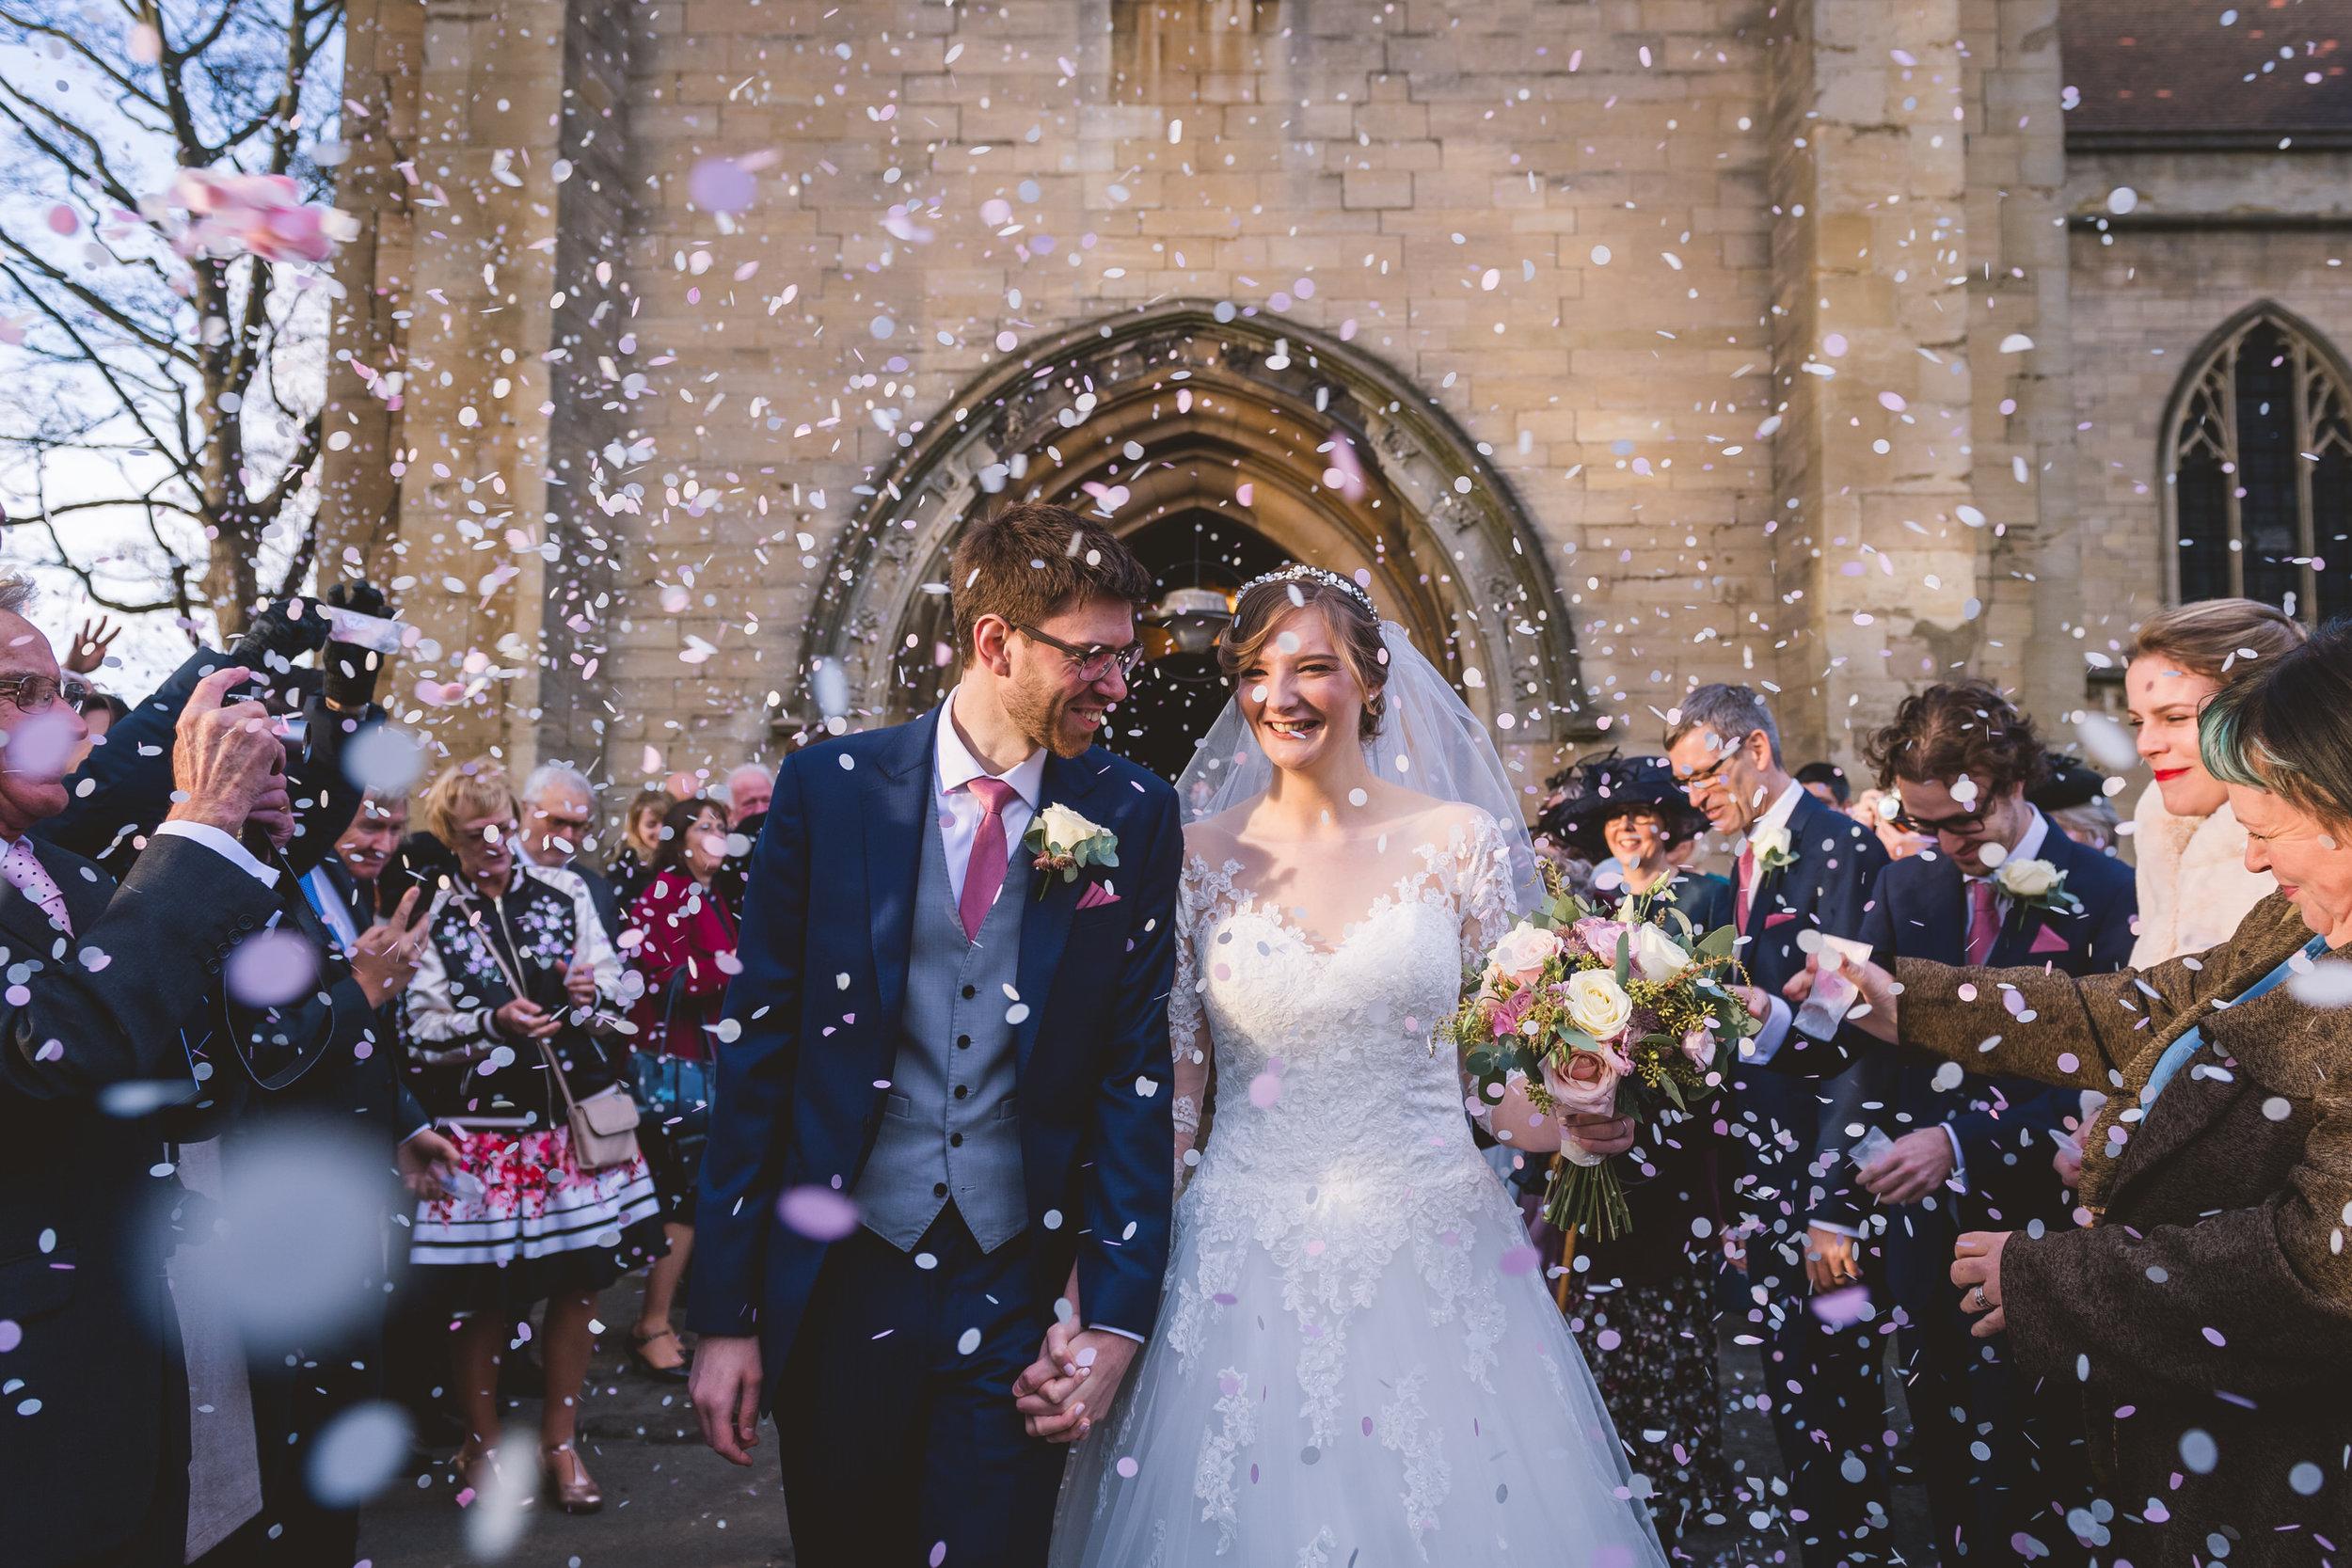 The-Old-Swan-Hotel-Harrogate-Wedding-Photographer-3.jpg